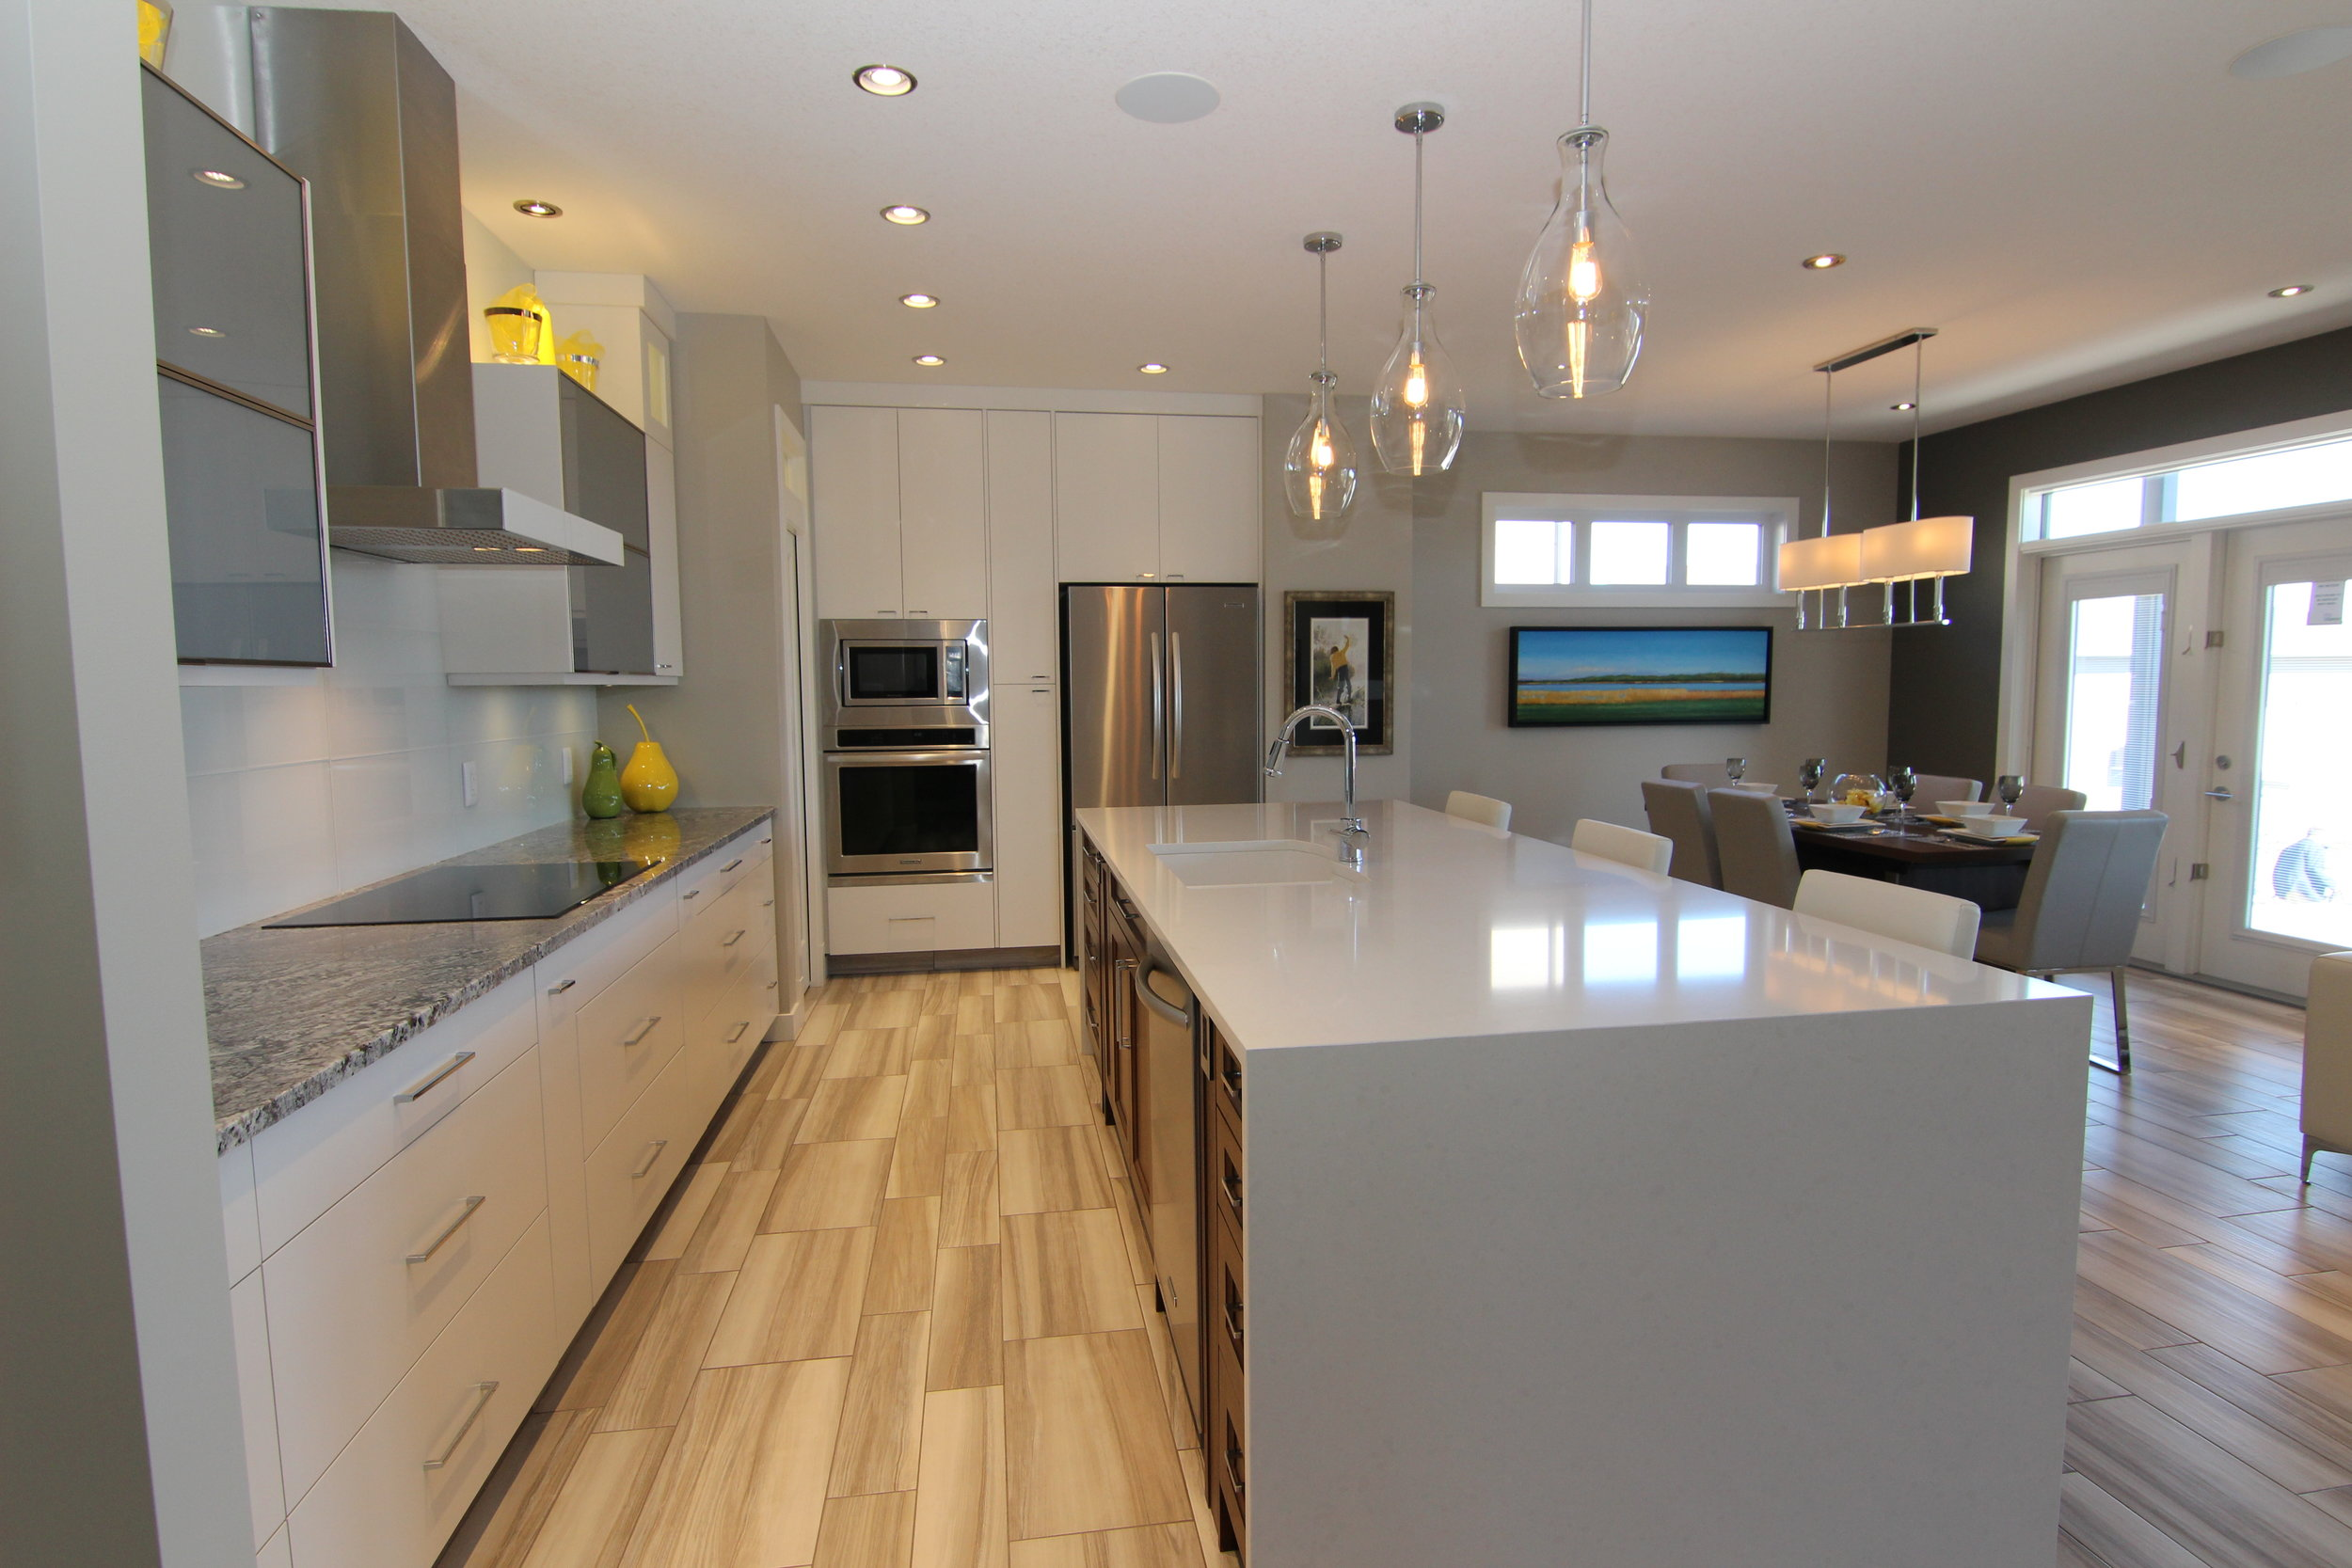 5286 Aviator Crescent (17)Kitchen.JPG